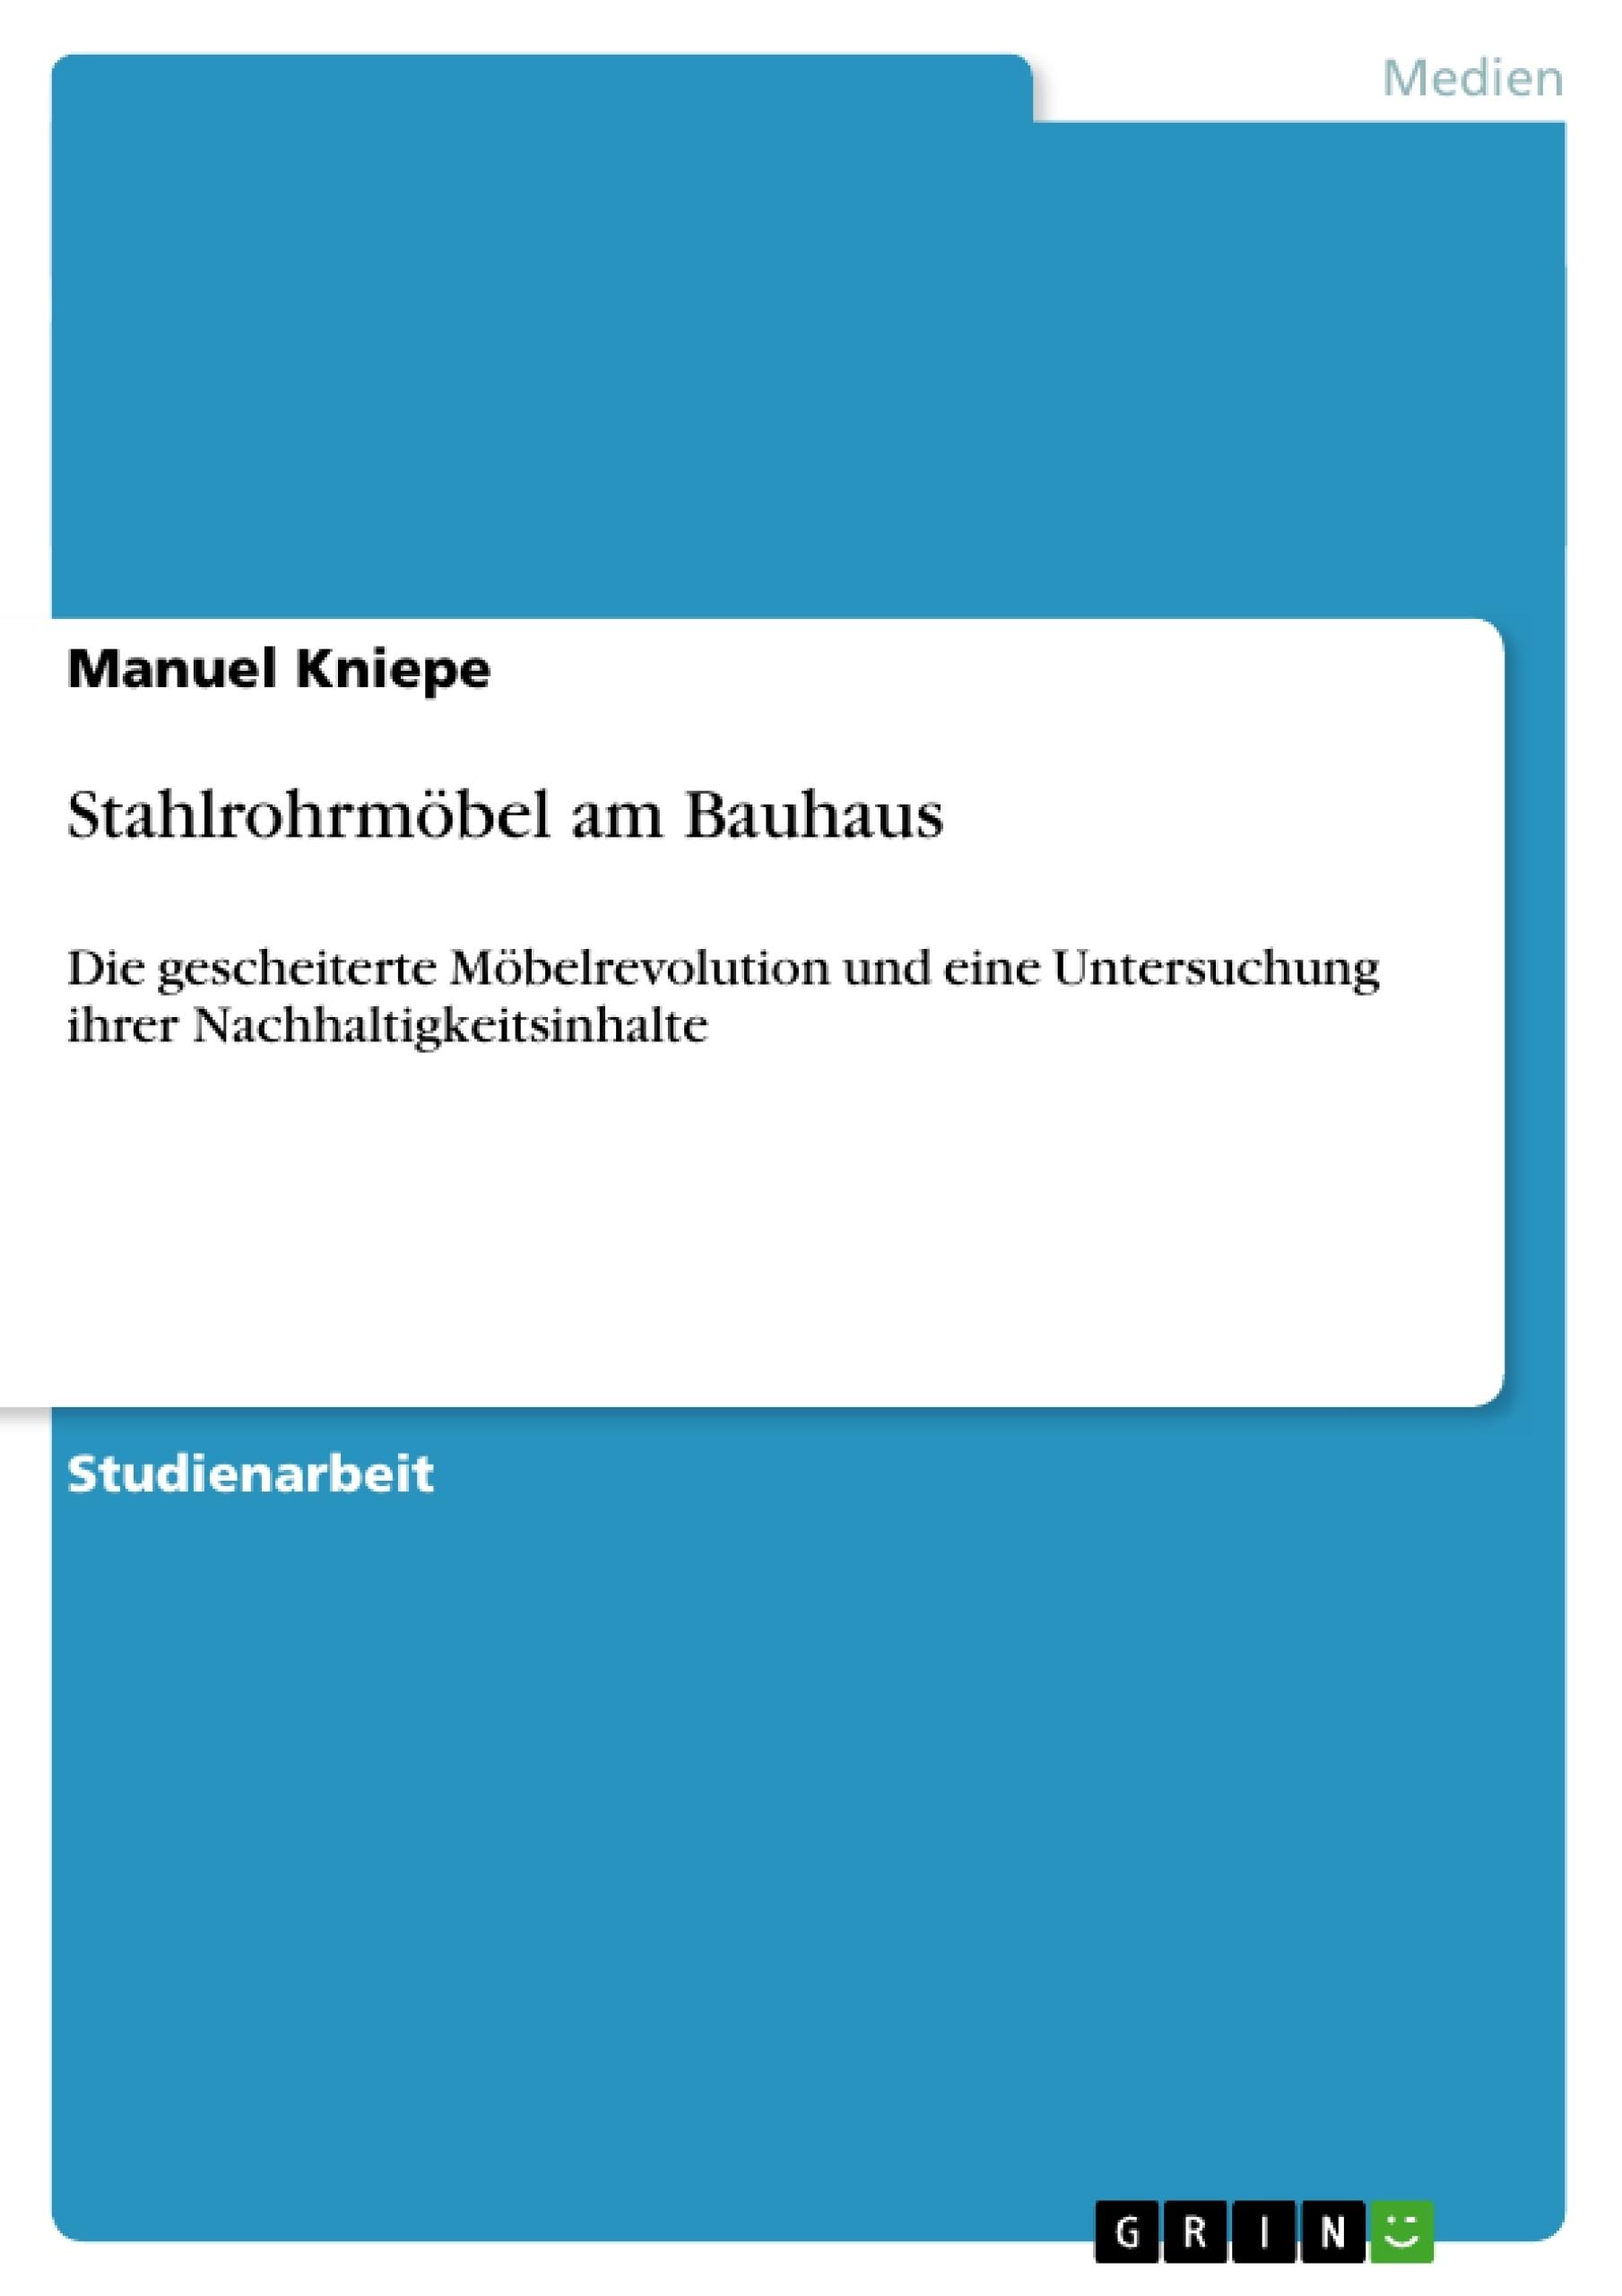 Titel: Stahlrohrmöbel am Bauhaus